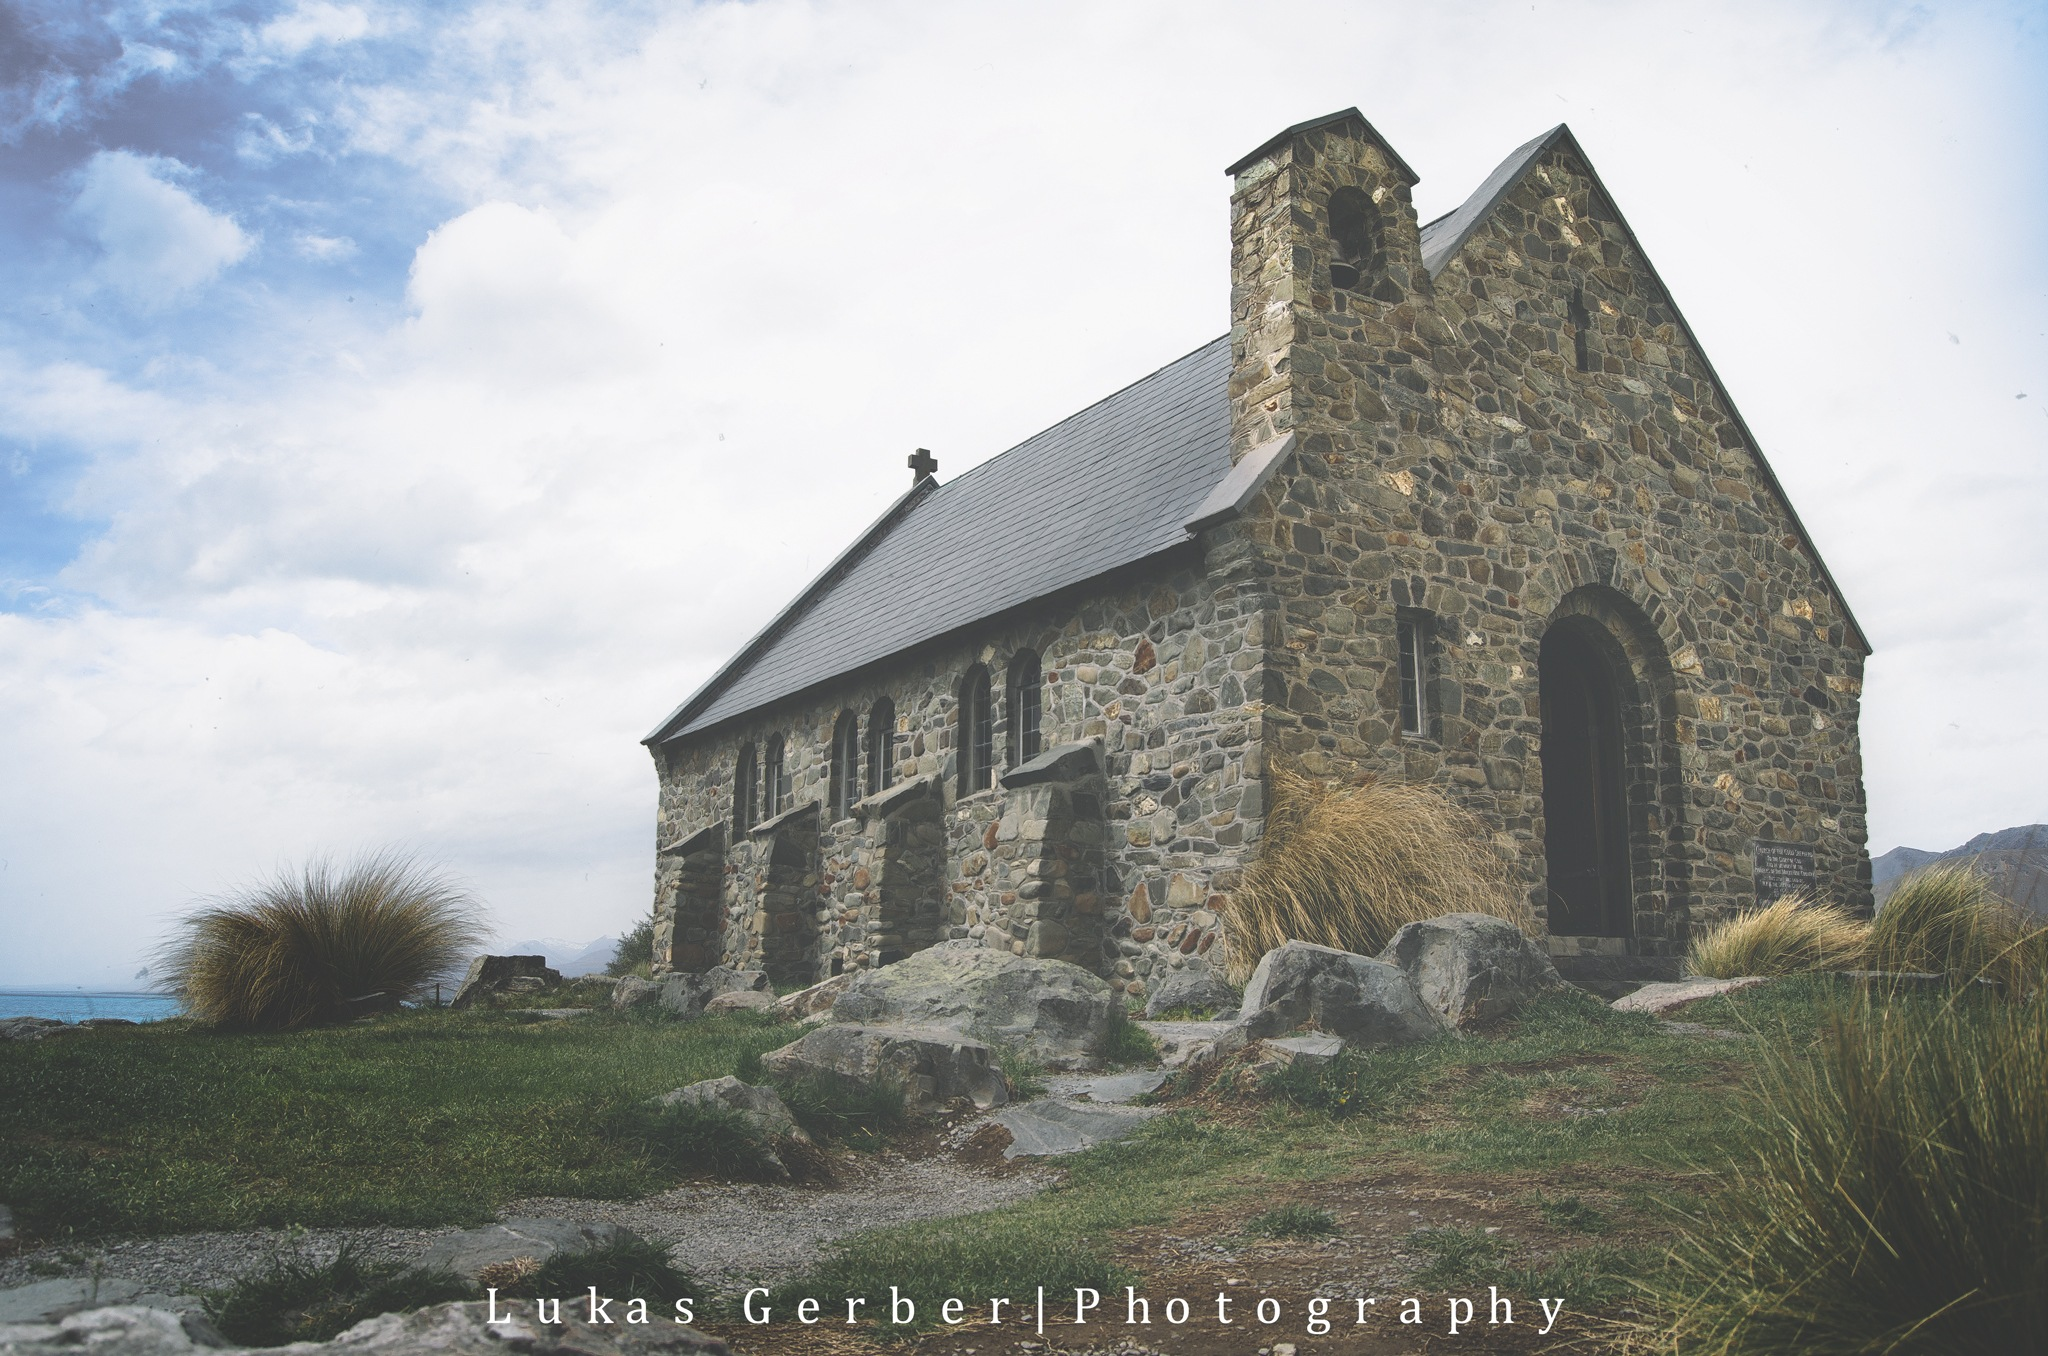 Church of the Good Shepherd by Lukas Gerber